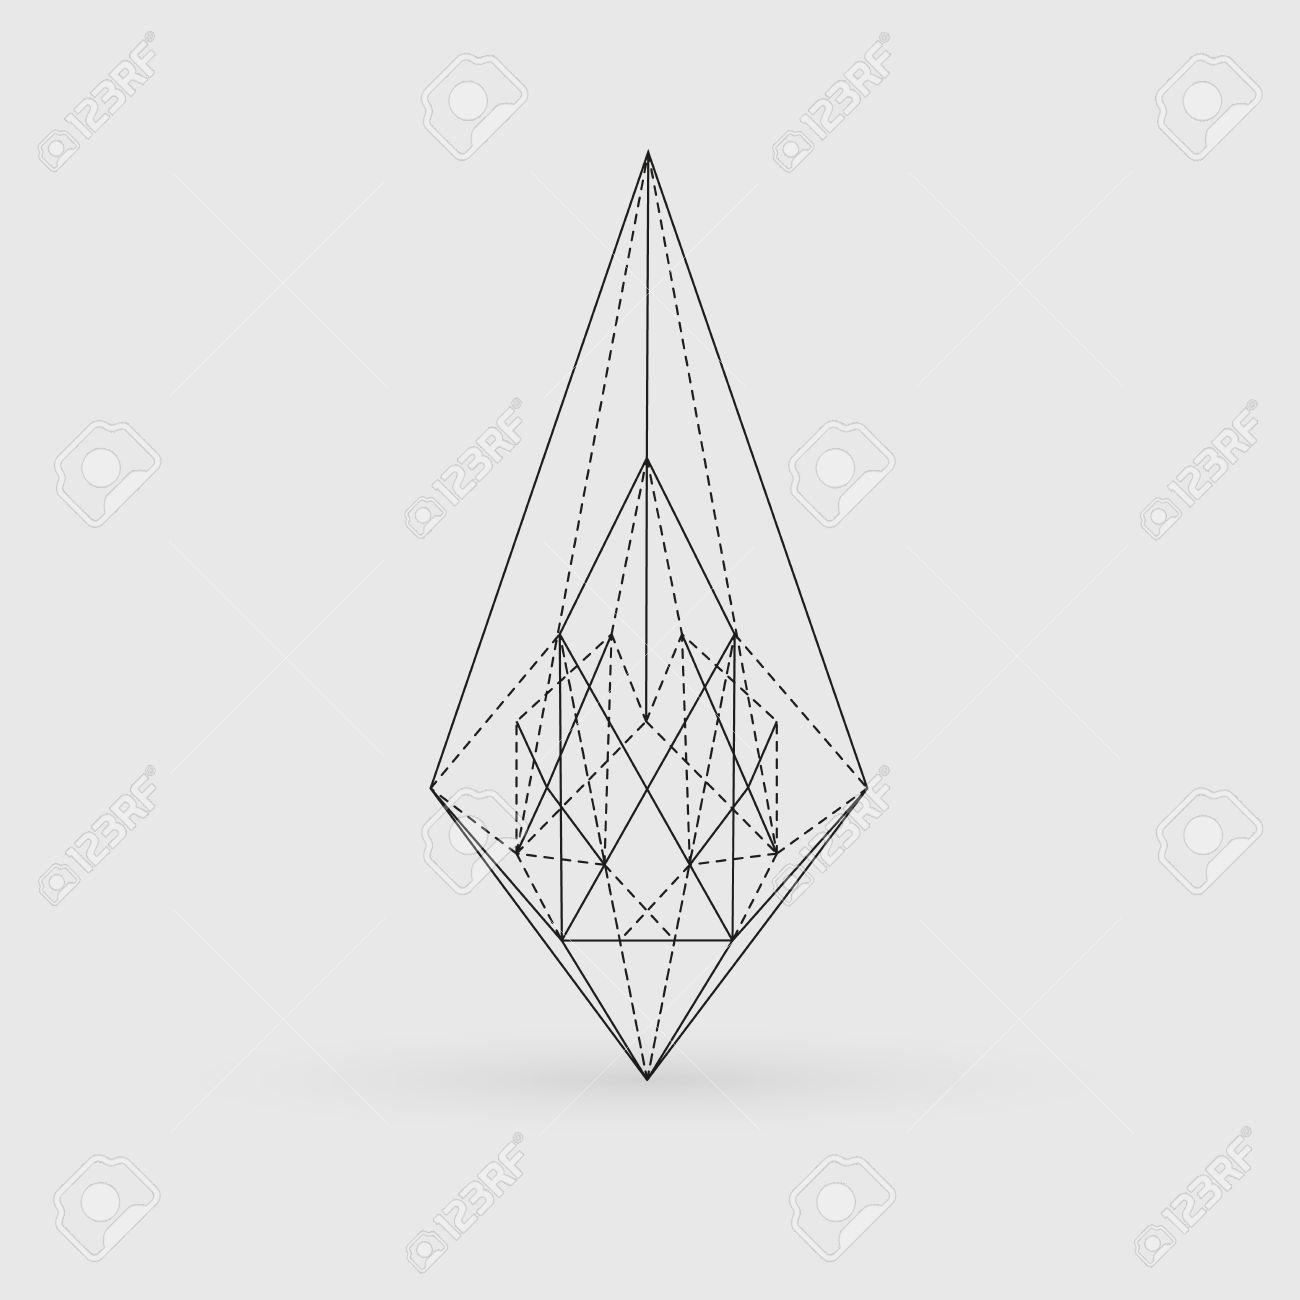 Geometry Line Art.